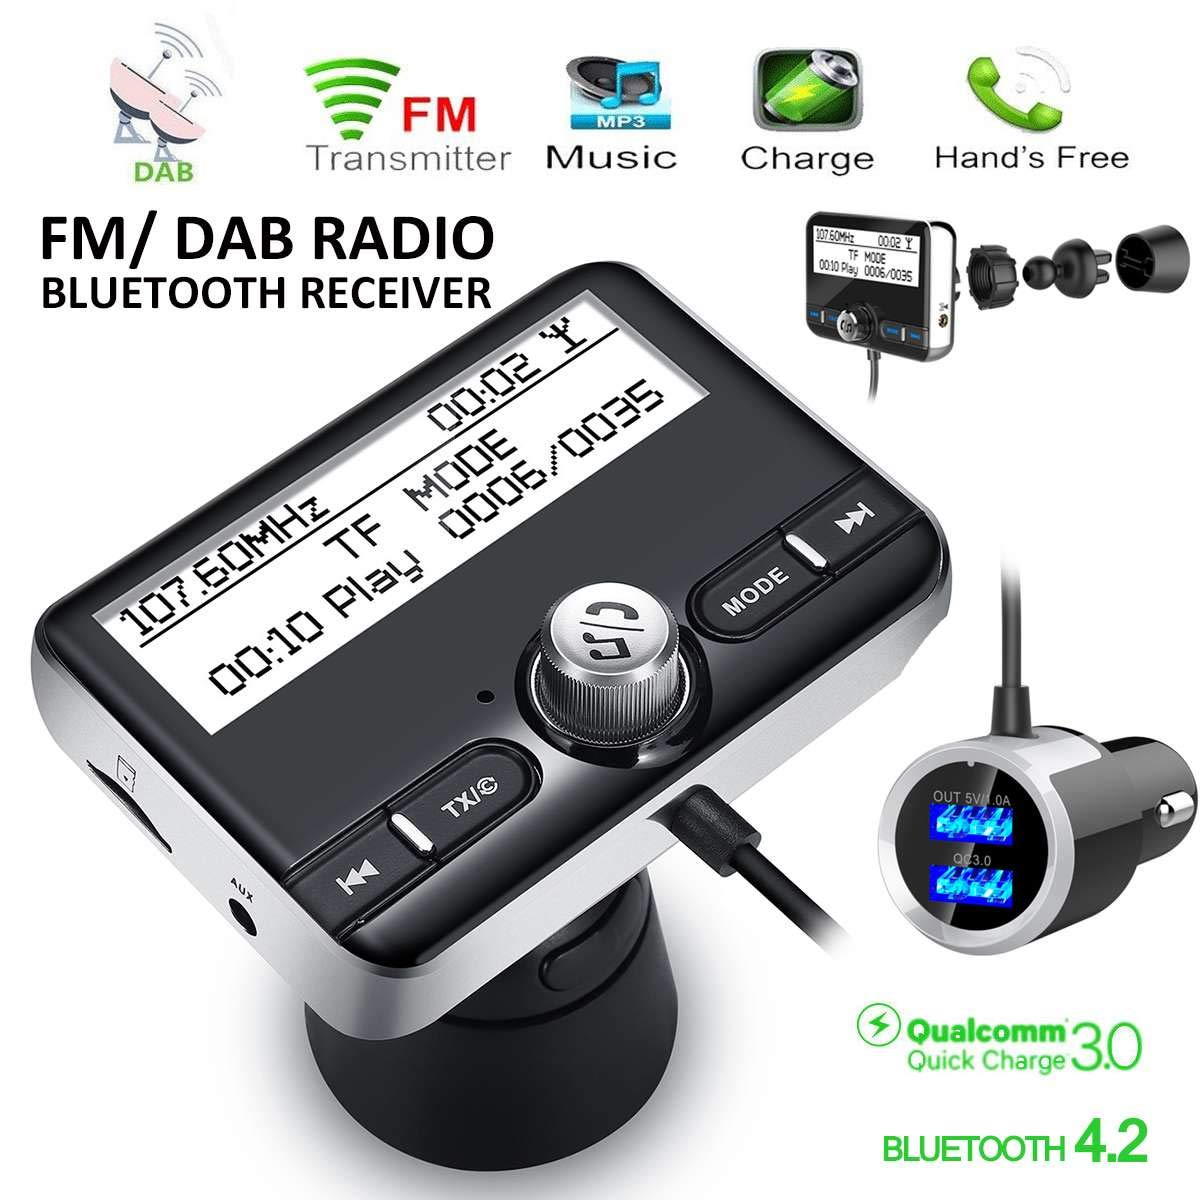 Carvicto - In-car DAB/DAB+ Radio Digital Radio Receiver Tuner USB Adapter FM Transmitter Antenna LCD Display Handsfree Calling W/Bluetooth